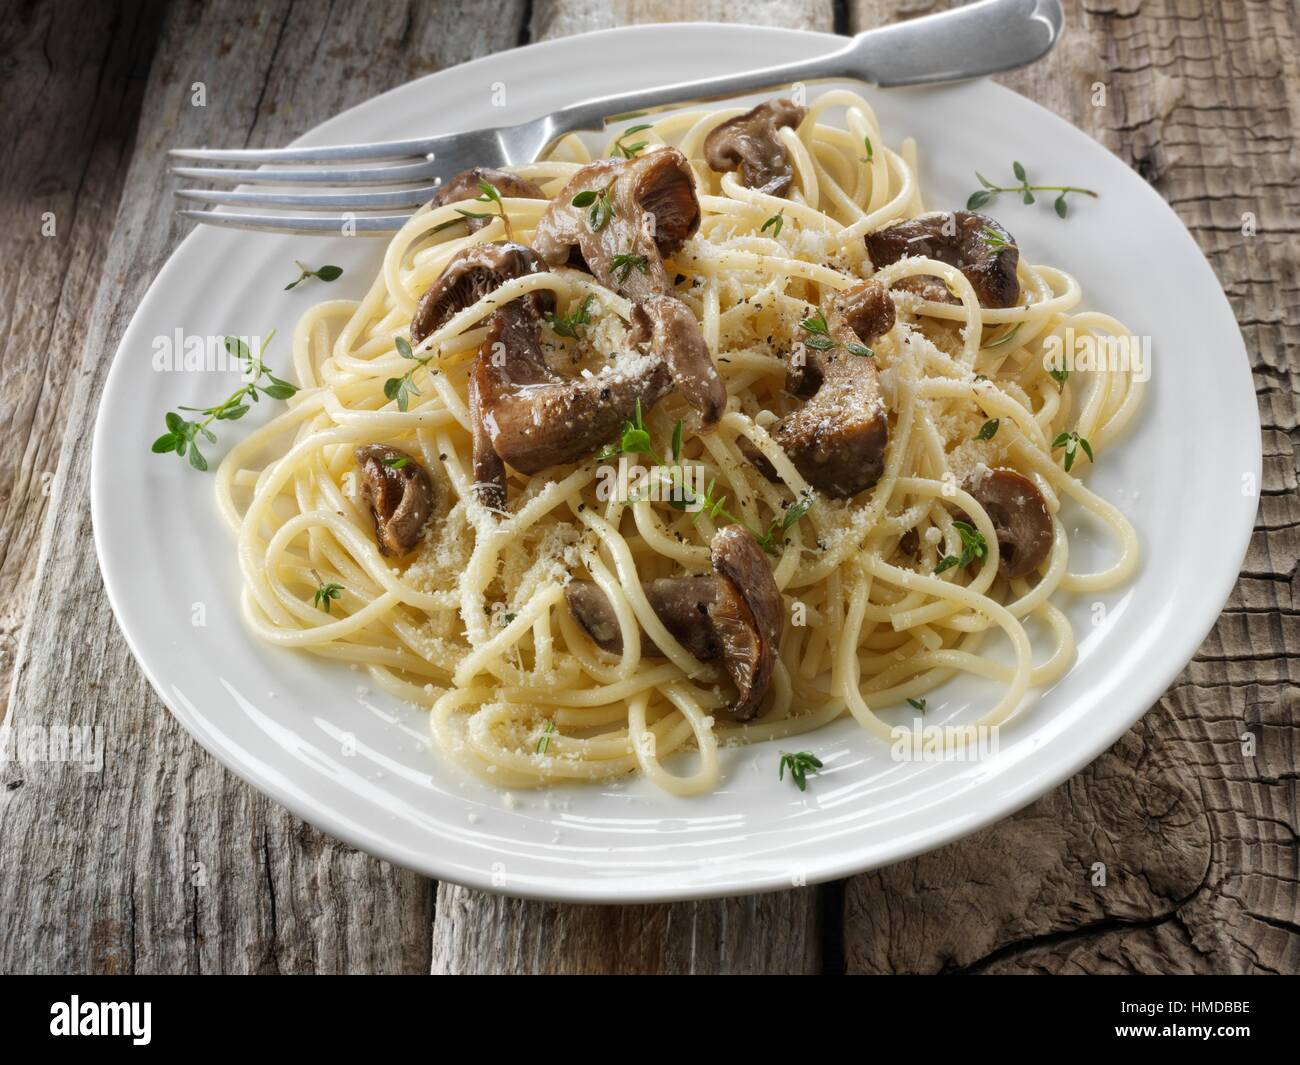 Sautierte Wiild organischer Pied Bleu Pilze (Clitocybe Nuda) oder blauen Fuß Pilze gekocht in Butter mit Spaghetti. Stockfoto